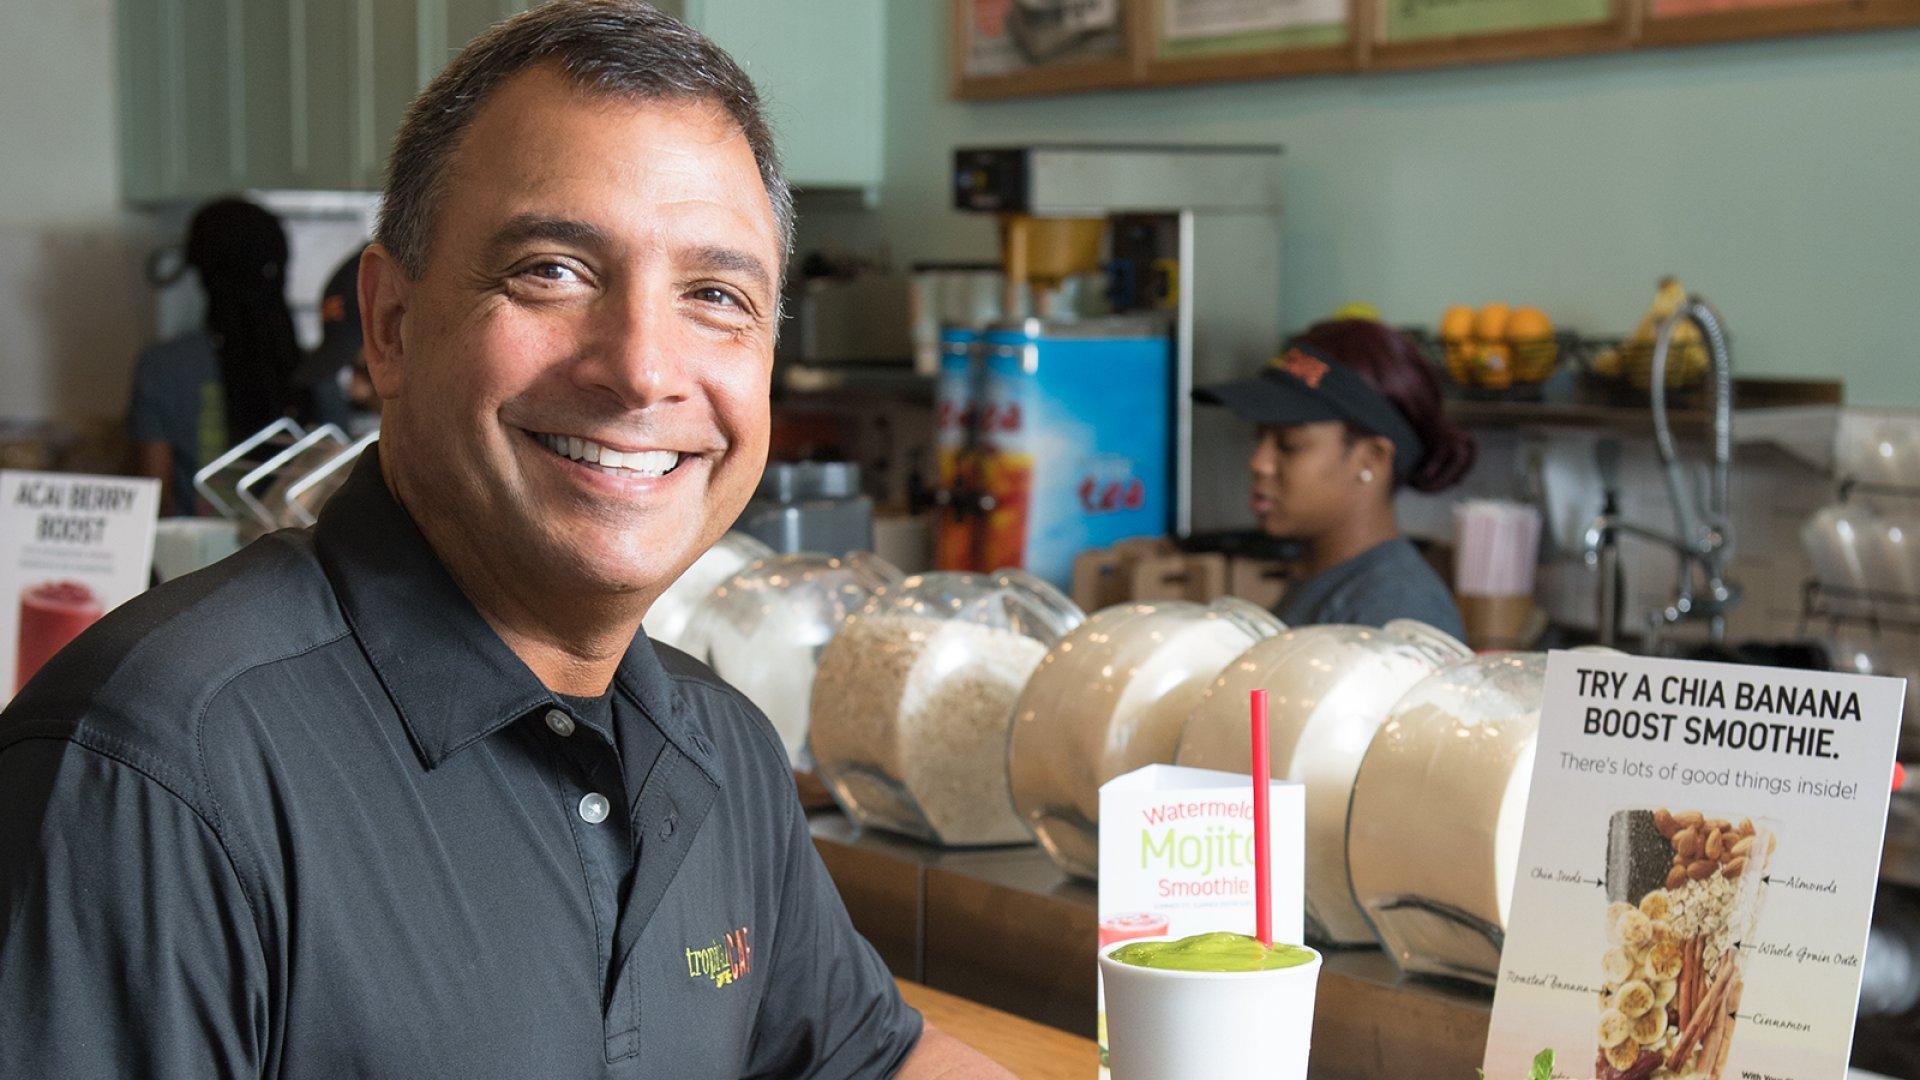 Mike Rotondo, CEO of Tropical Smoothie Cafes